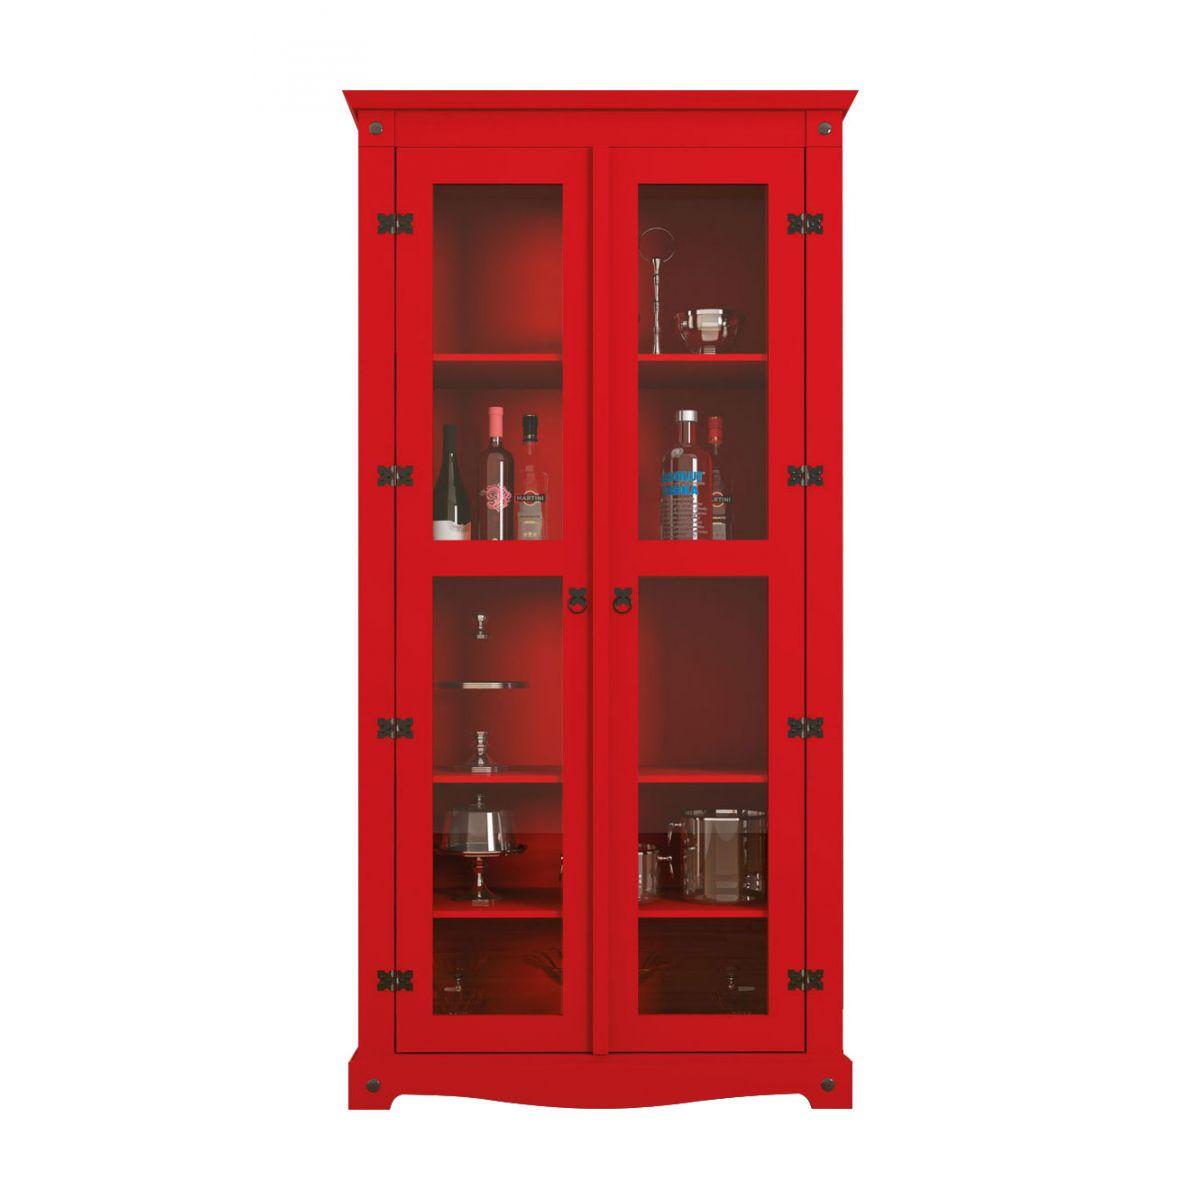 Cristaleira New York Vermelho - RV Móveis